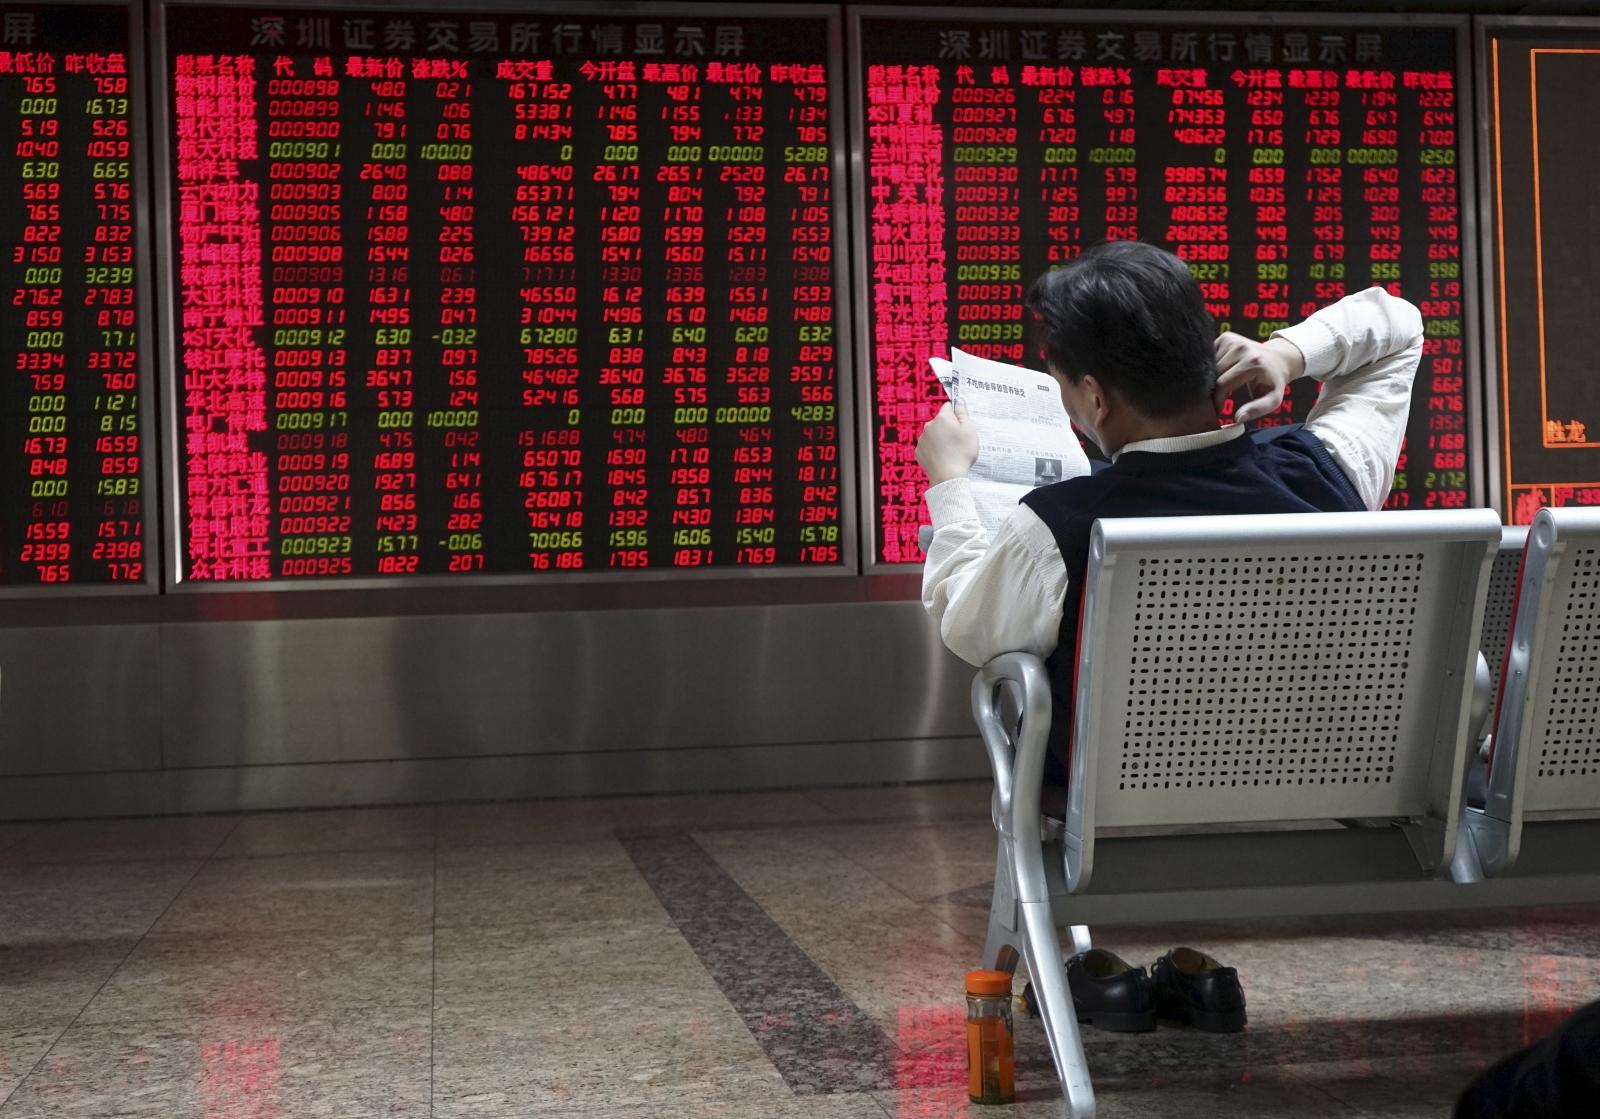 Asian markets: Shanghai Composite trades higher despite JPMorgan and Markit revealing weak global manufacturing data